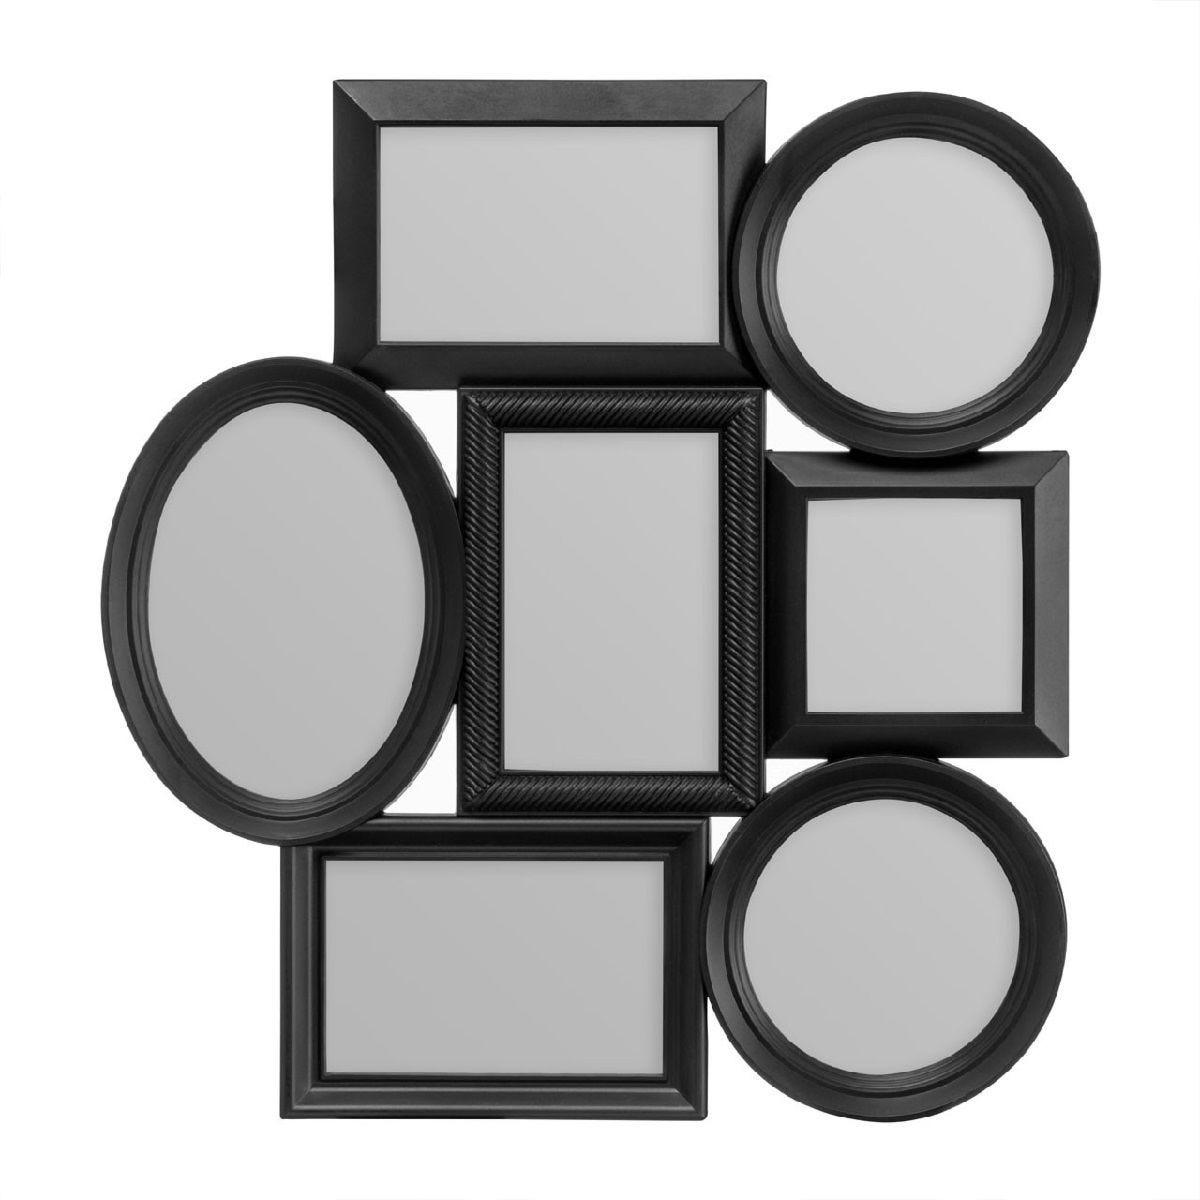 Premier Housewares Multi Photo Frame, 7 Photo in Black Plastic Frame - 1 Oval, 3 Rectangular, 2 Round,1 Square